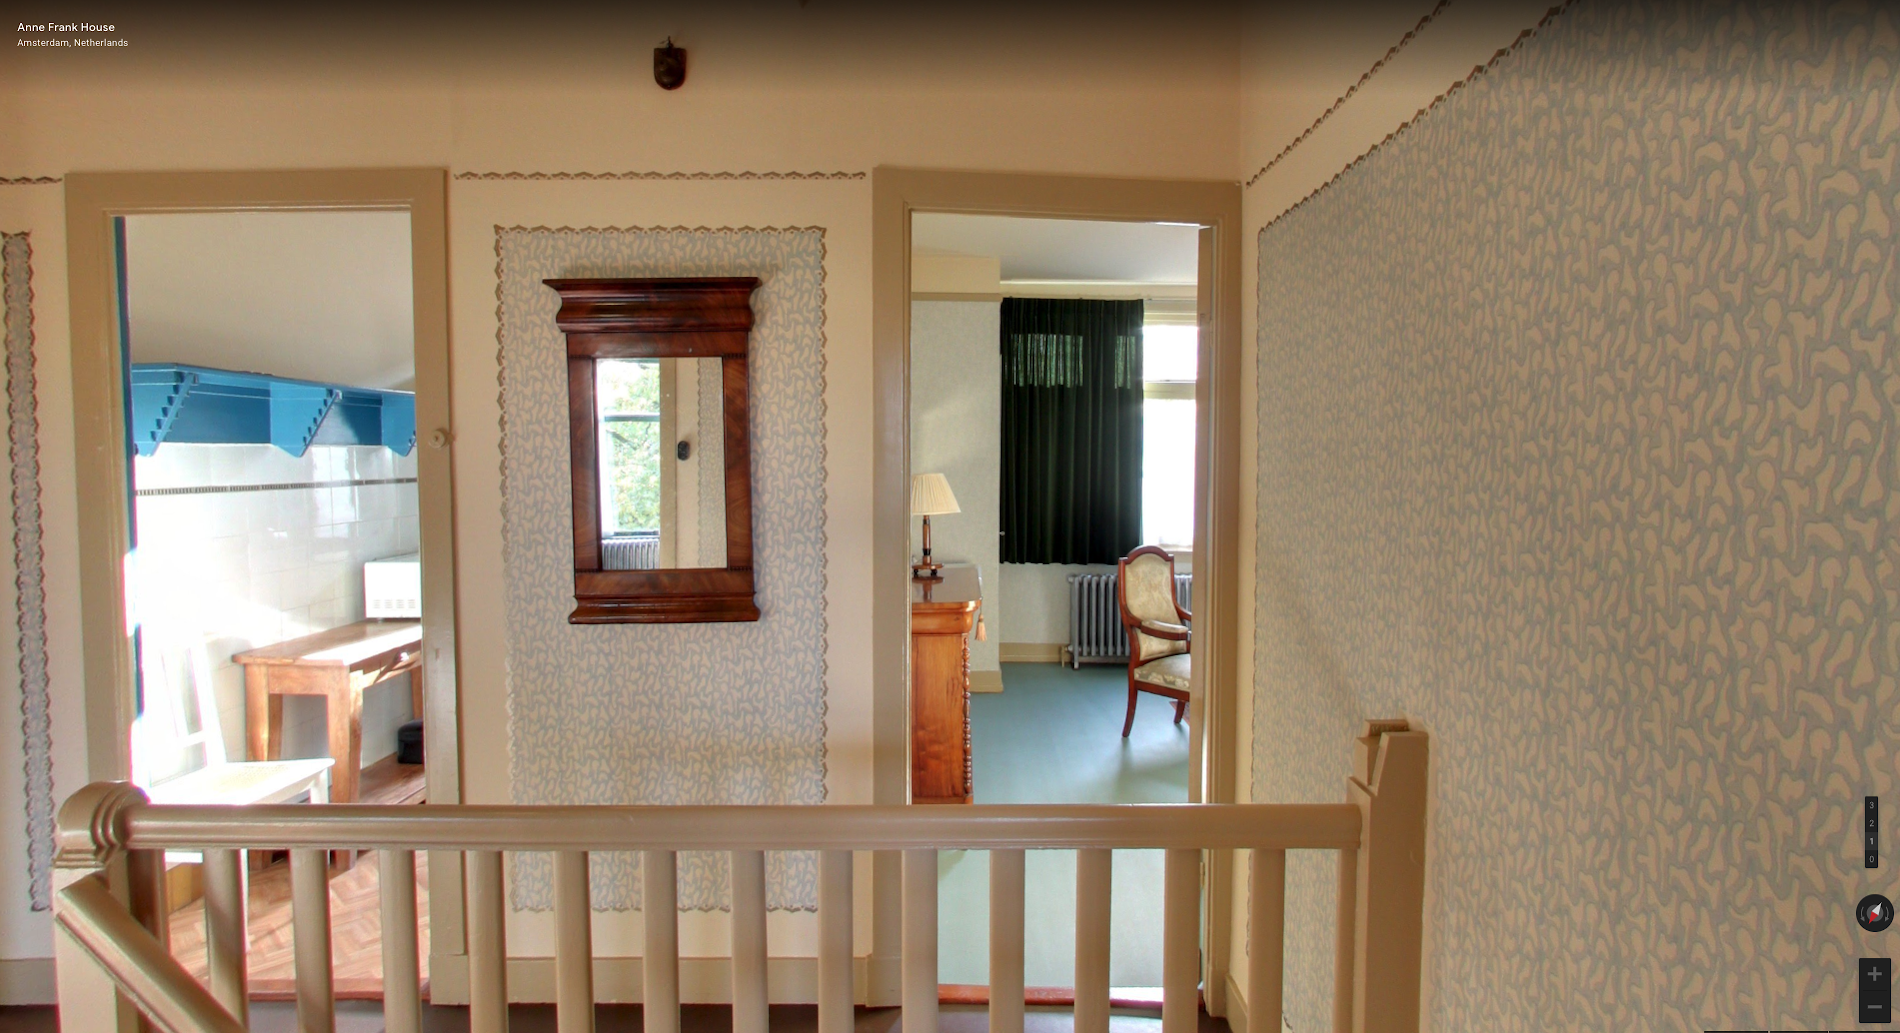 Visit Anne Frank's childhood home on Google Arts & Culture